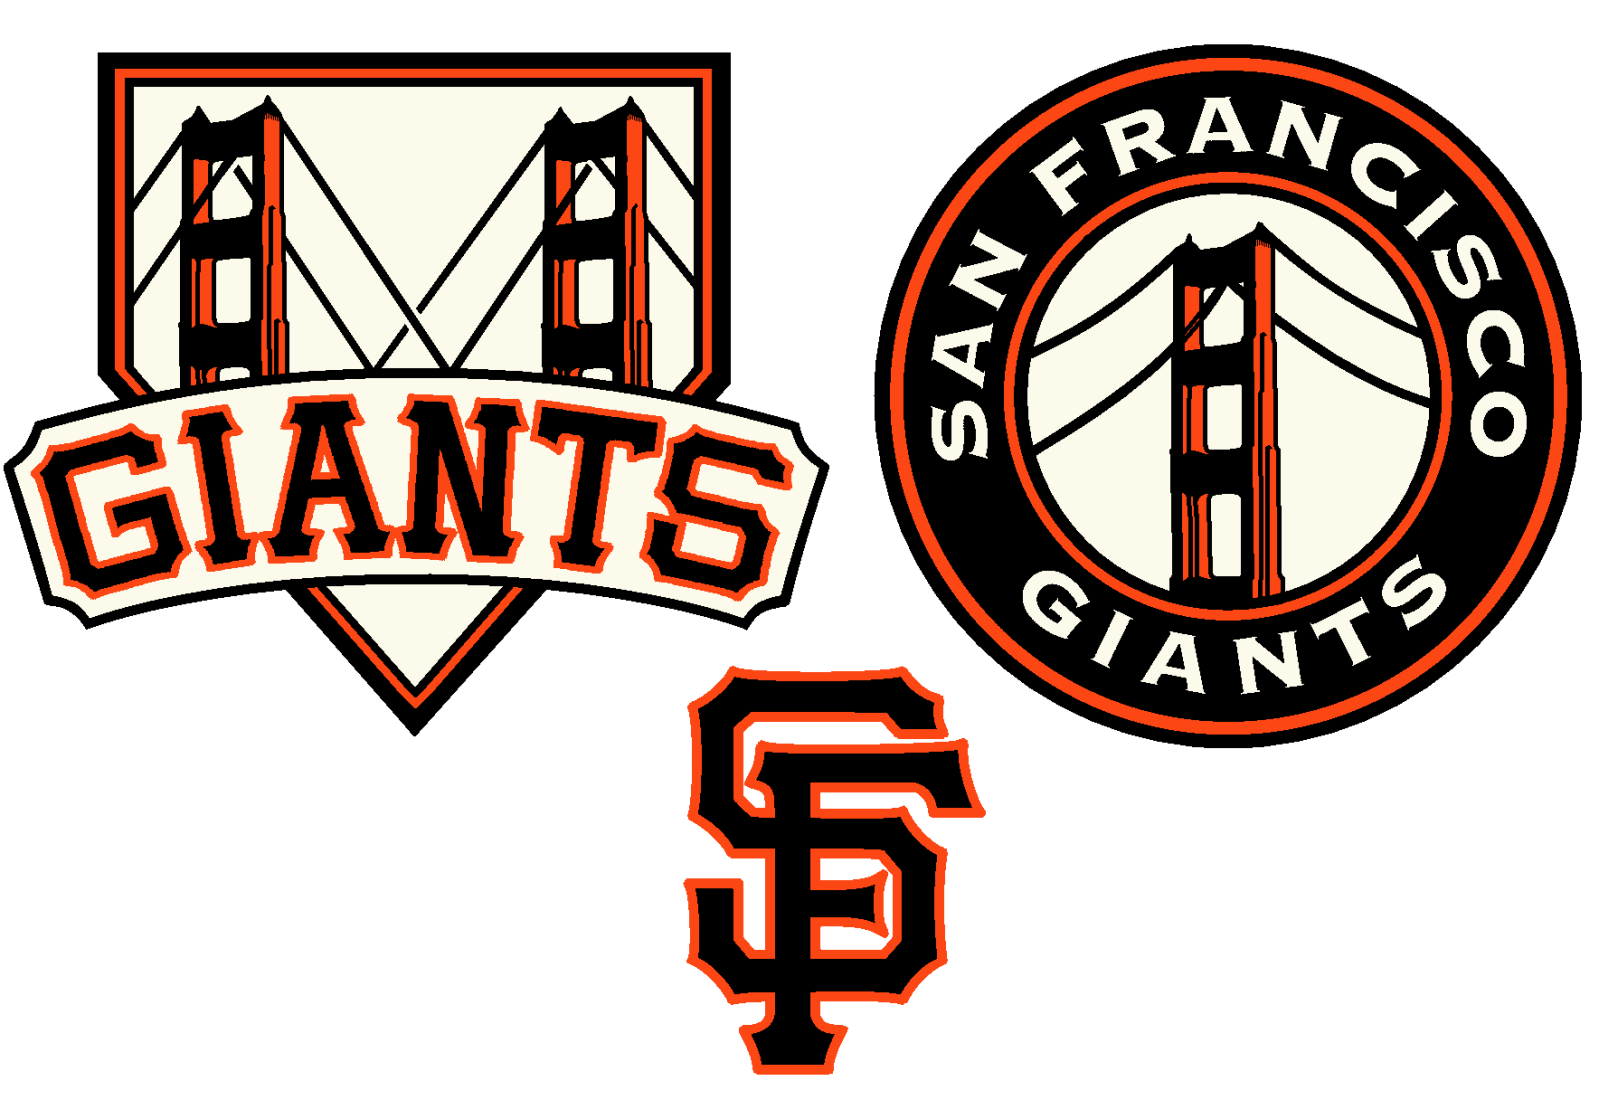 Pin By Jen Dior On Sports Banners San Francisco Giants Logo Sf Giants Logo Sport Banner